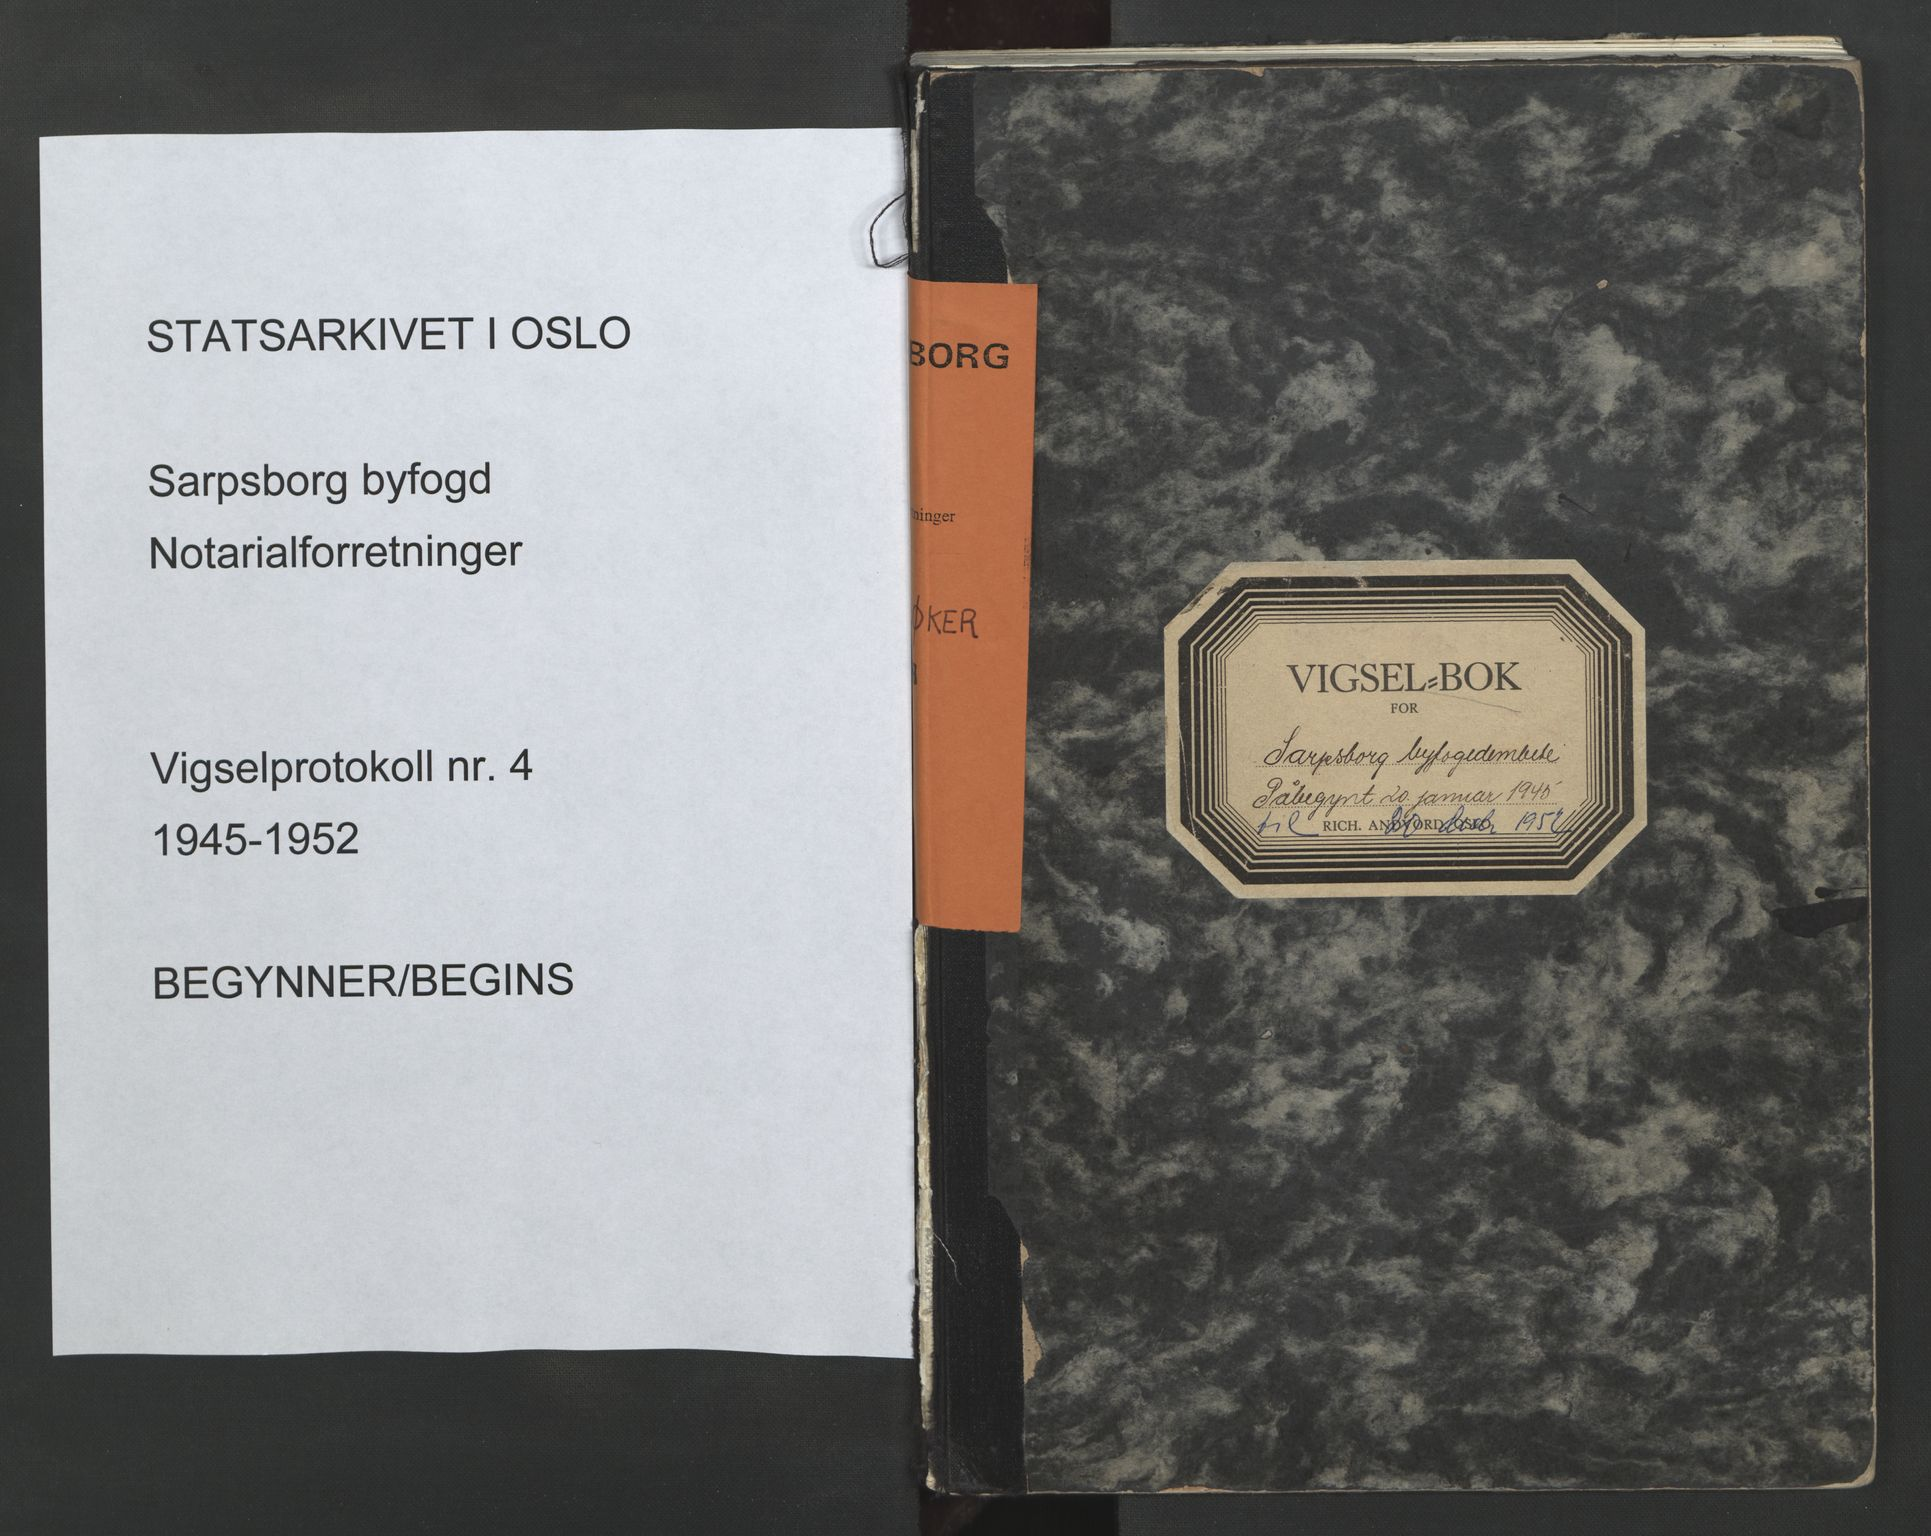 SAO, Sarpsborg byfogd, L/Lb/Lba/L0004: Vigselbok, 1945-1952, s. upaginert